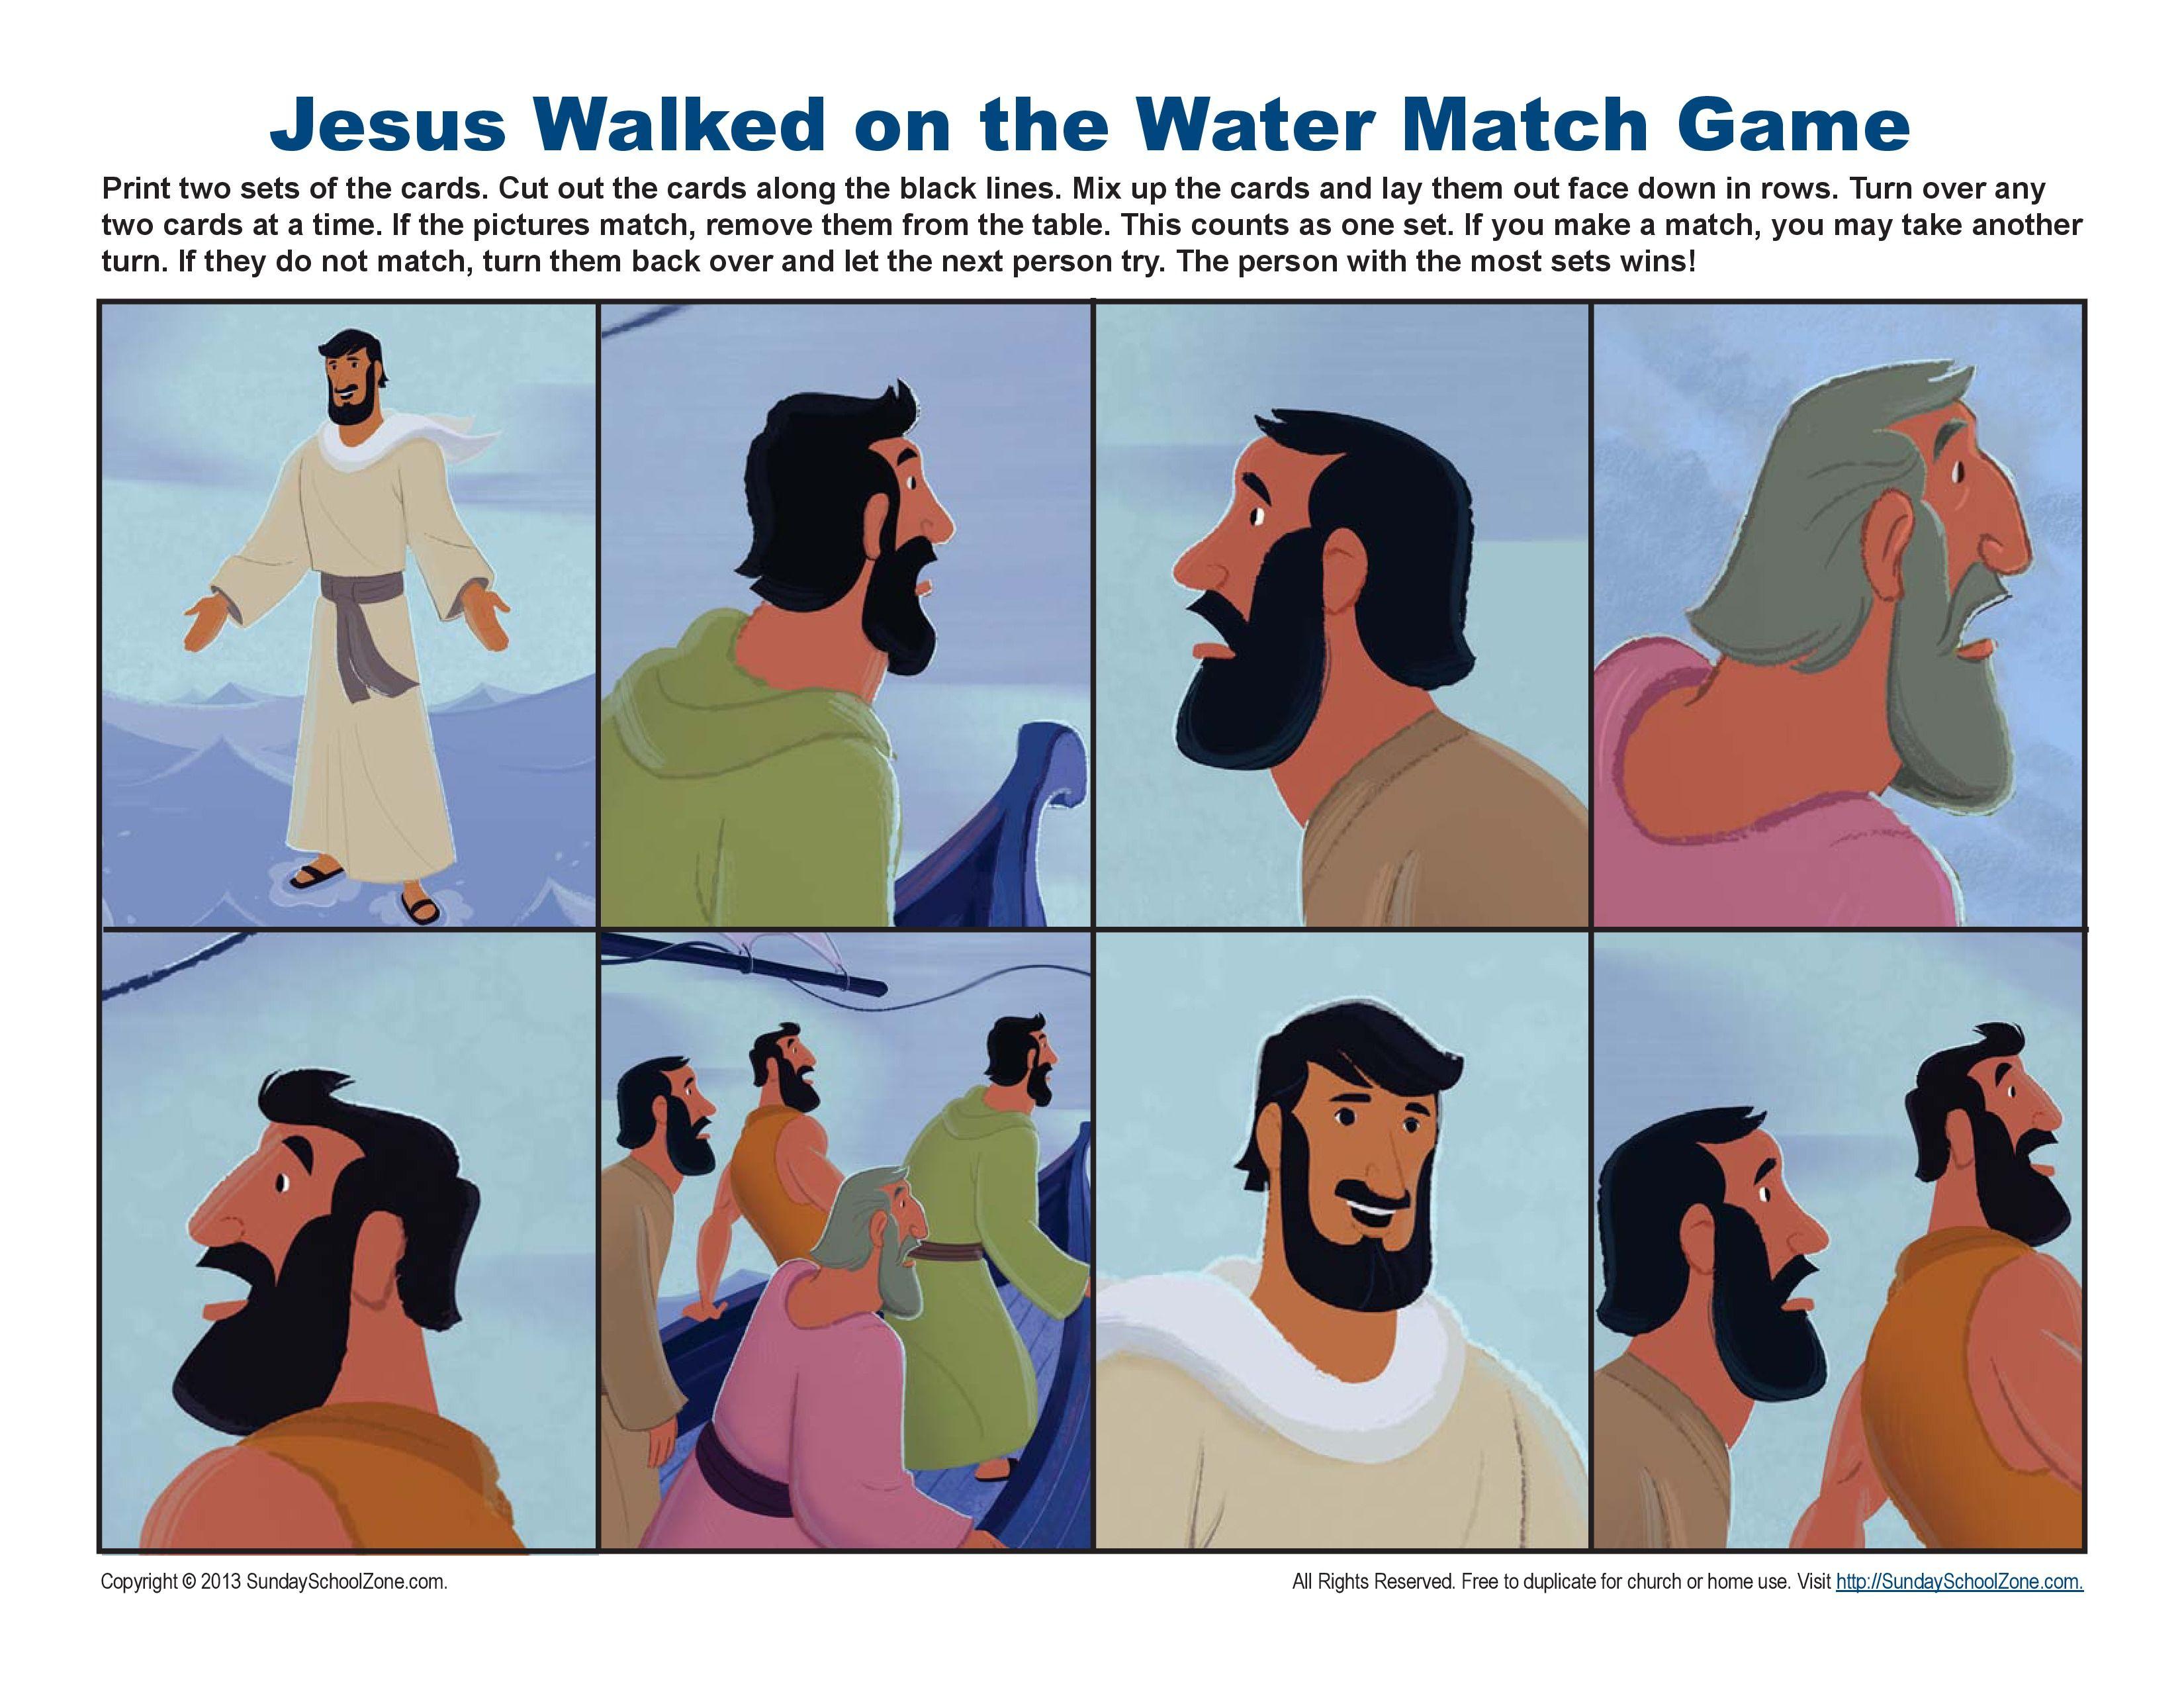 Jesus Walked on Water Match Game